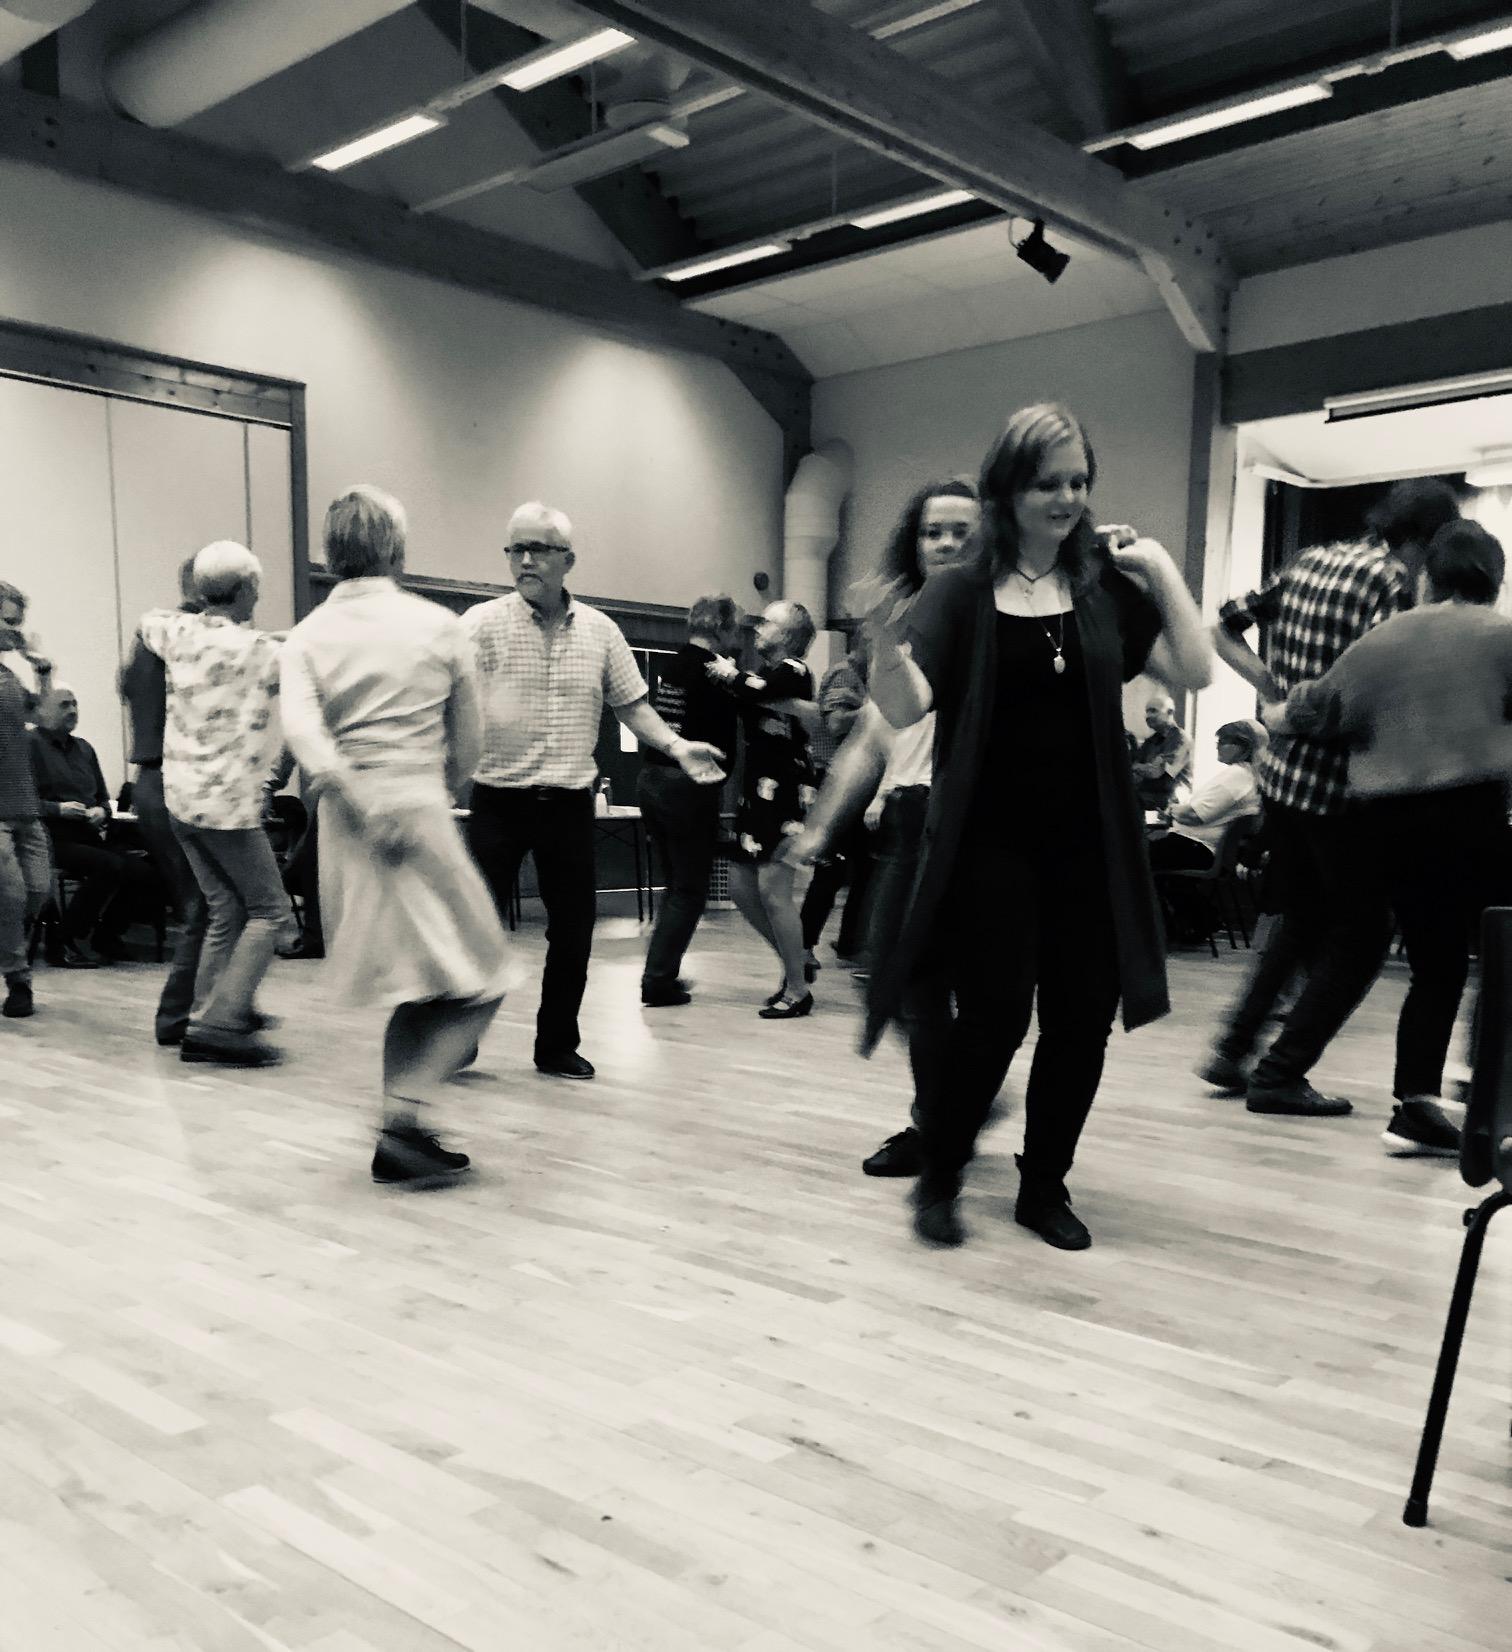 Dansegulvet på Fuglen 13. oktober 2018